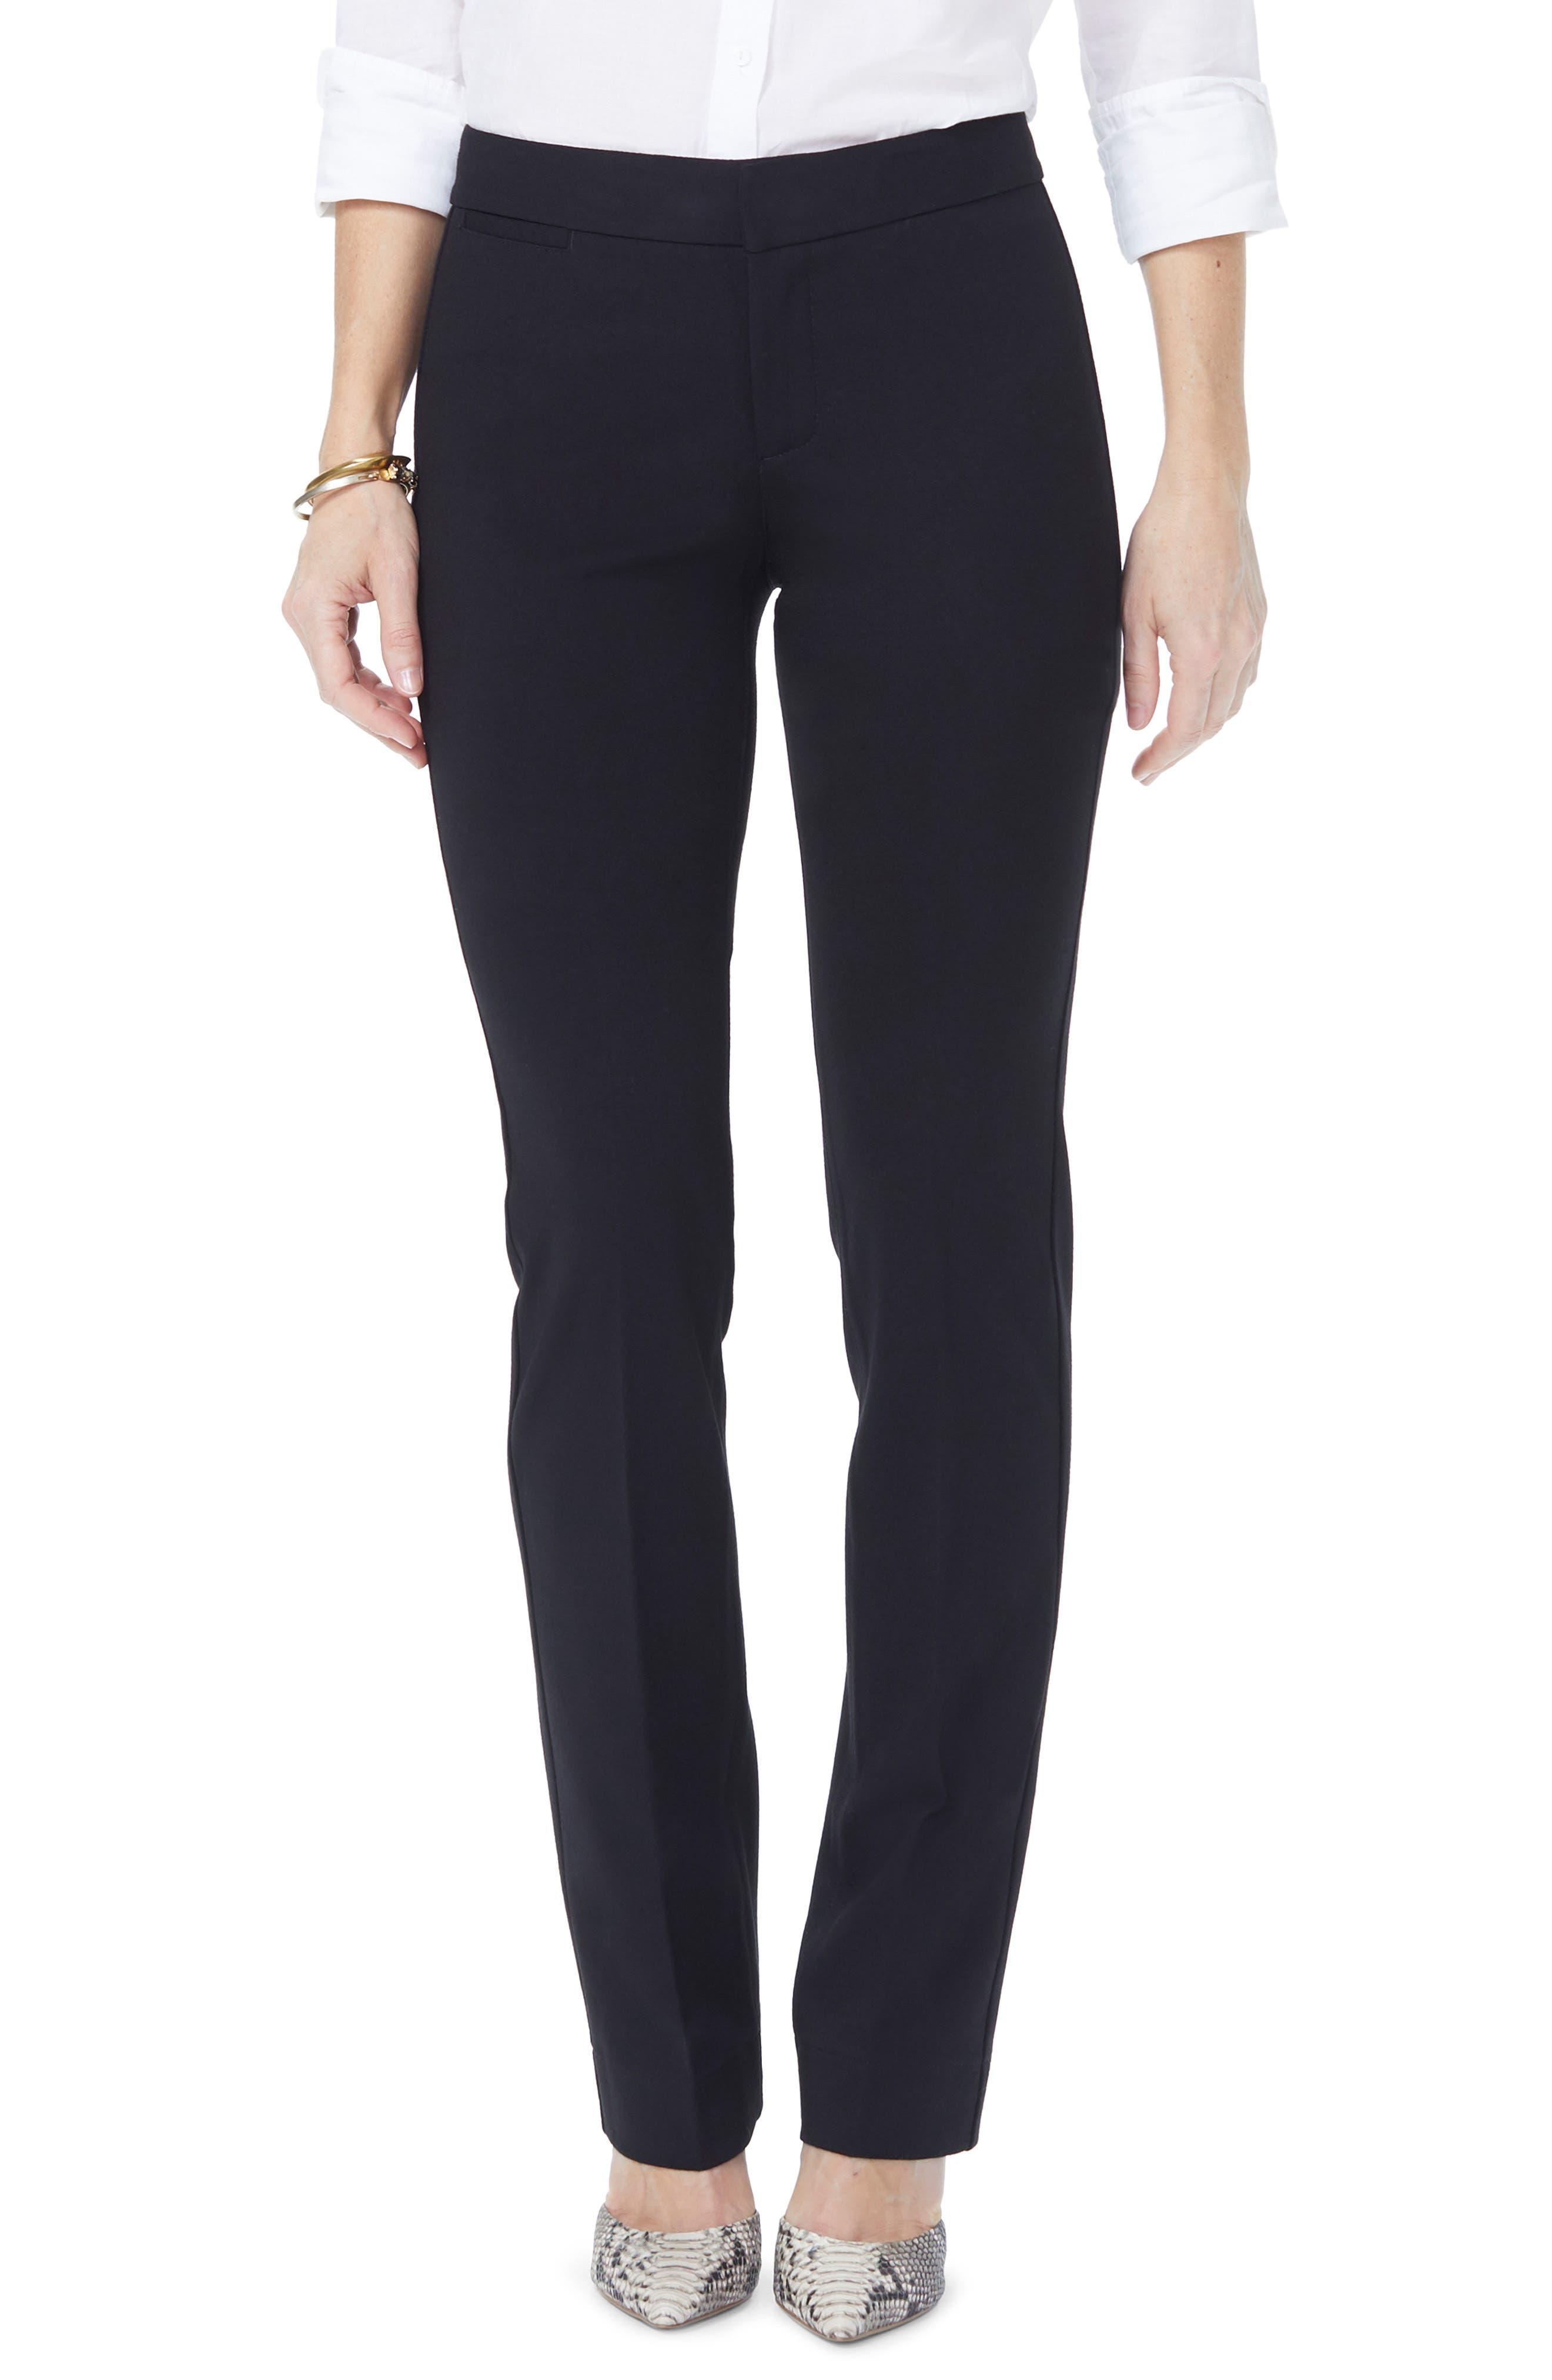 NYDJ, Stretch Knit Trousers, Main thumbnail 1, color, BLACK